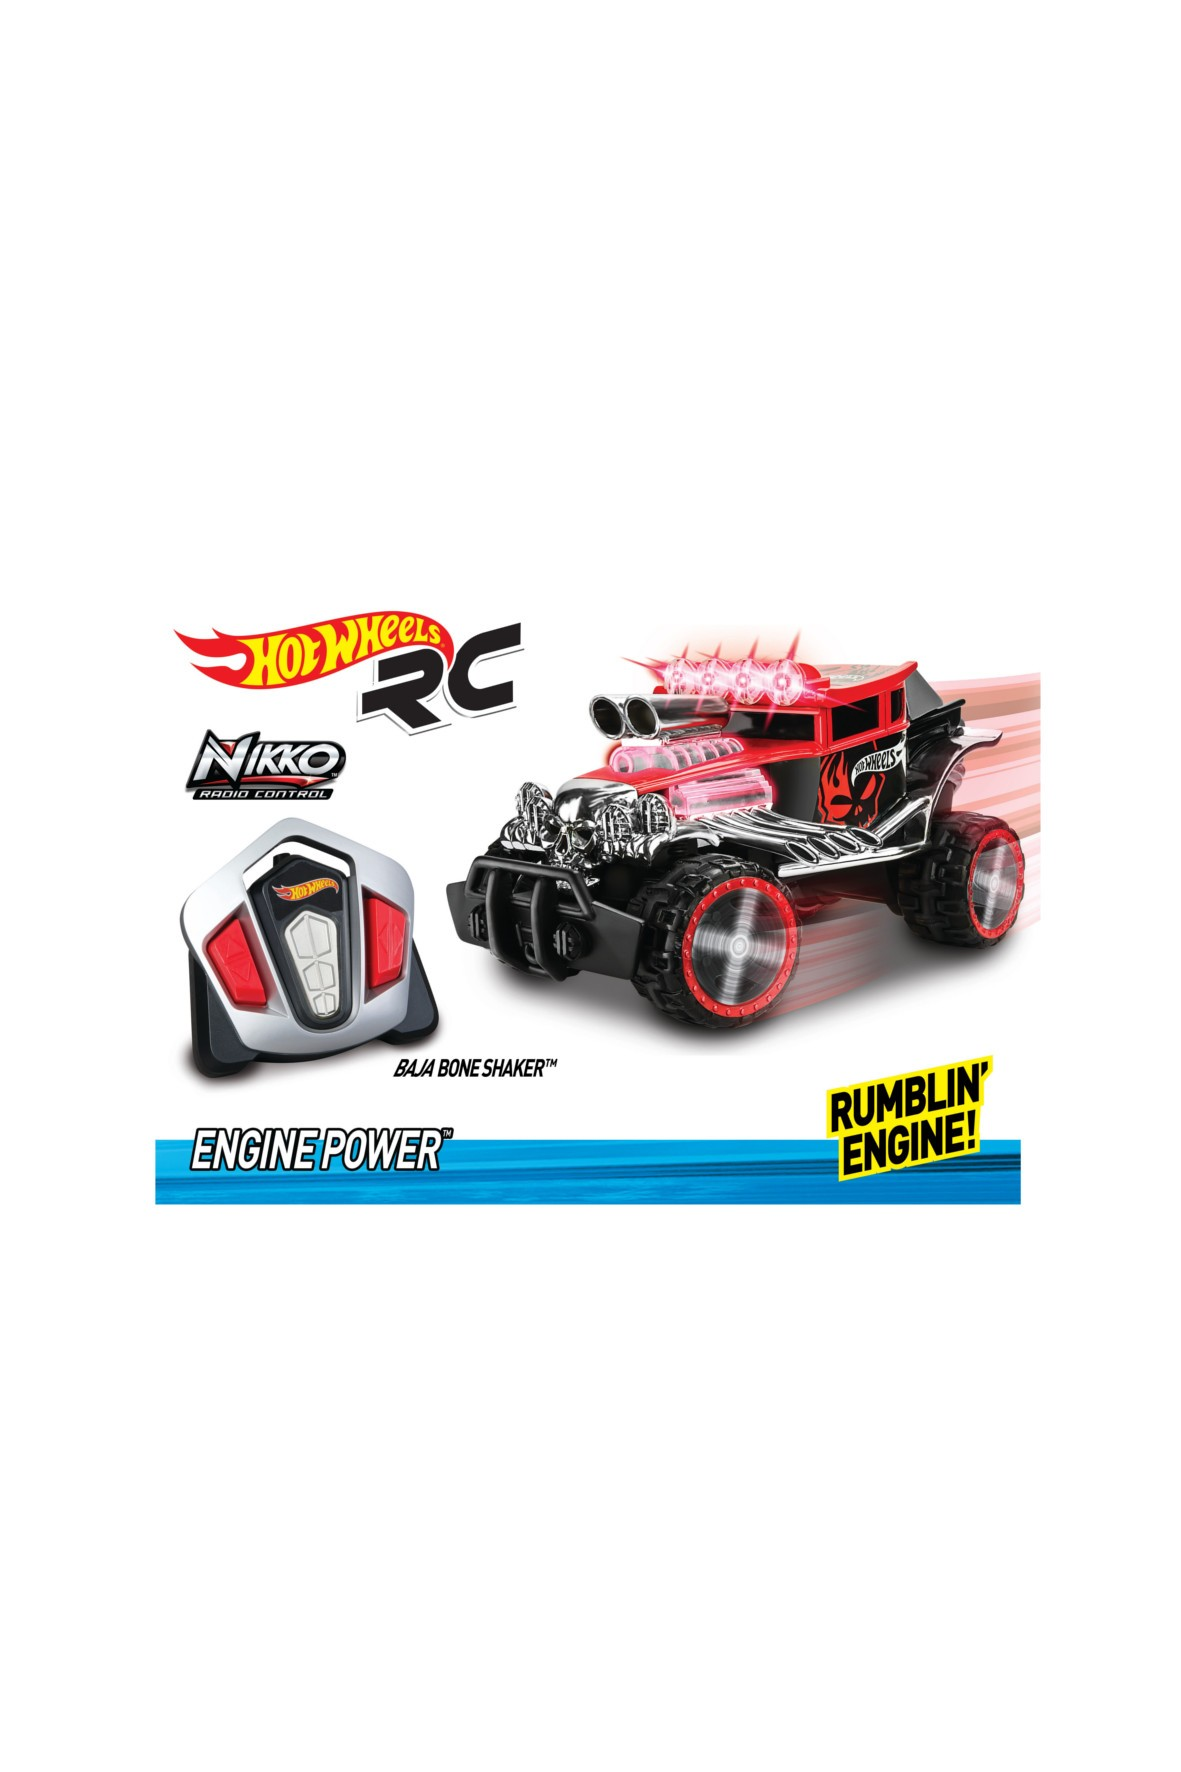 Hot Wheels- BAJA BONE SHAKER